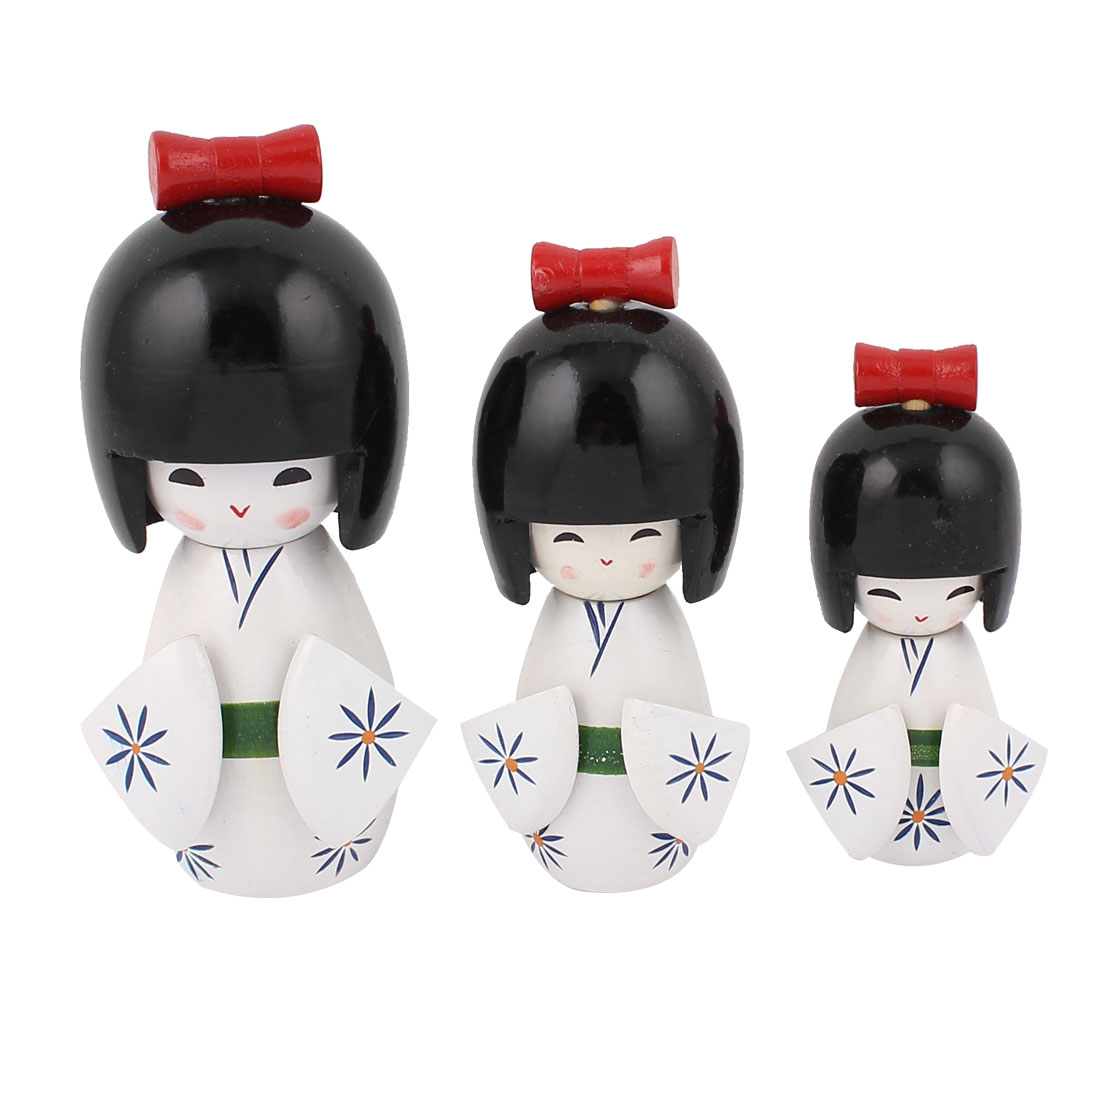 3 in 1 Handmade Flower Decor Kimono Wooden Craft Japanese Kokeshi Doll White